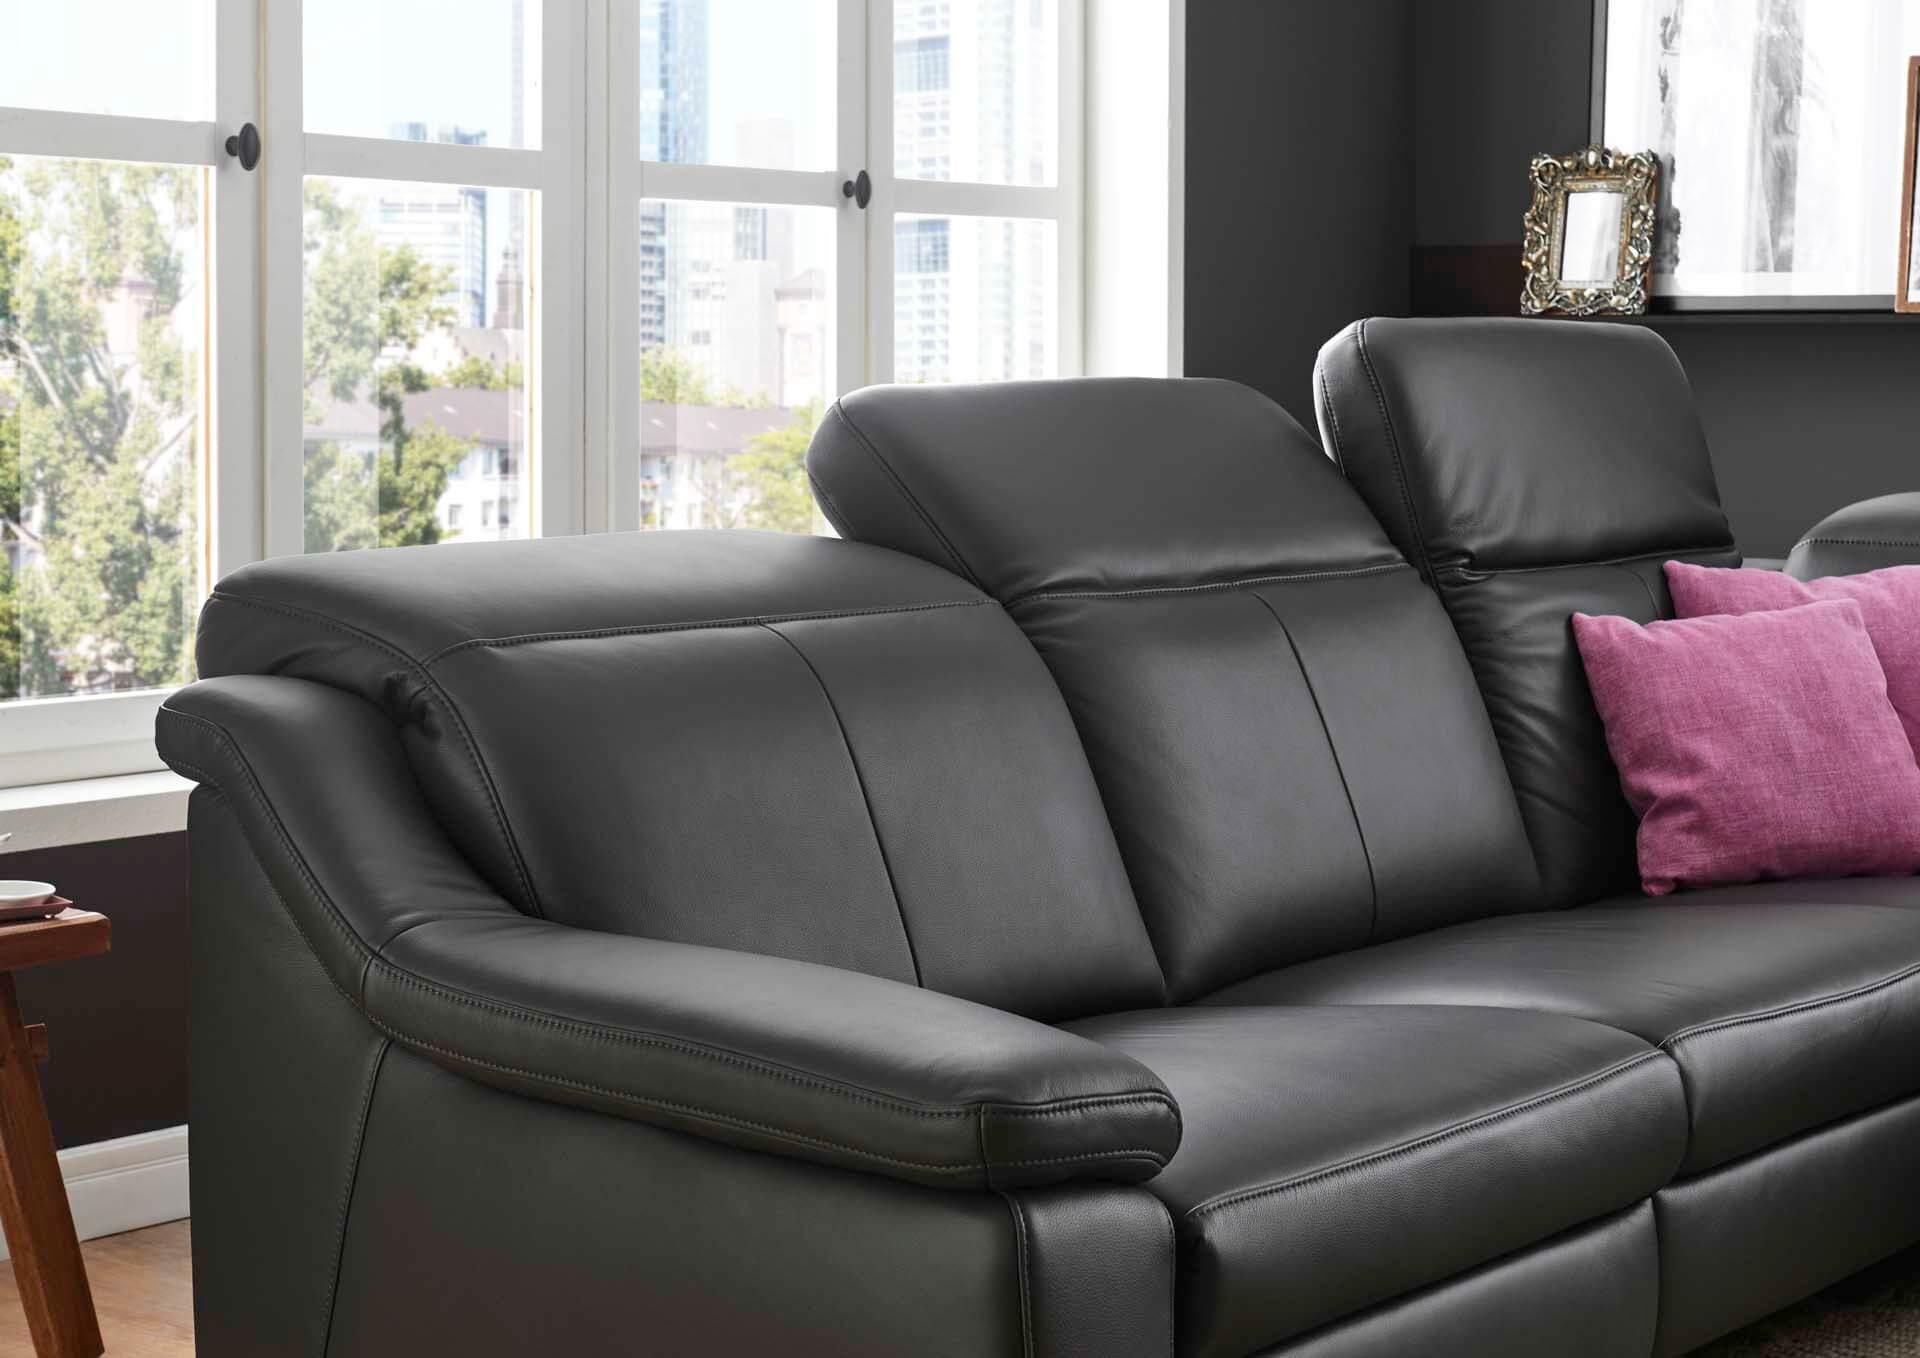 Sofa-Harlem-Com4Lux9